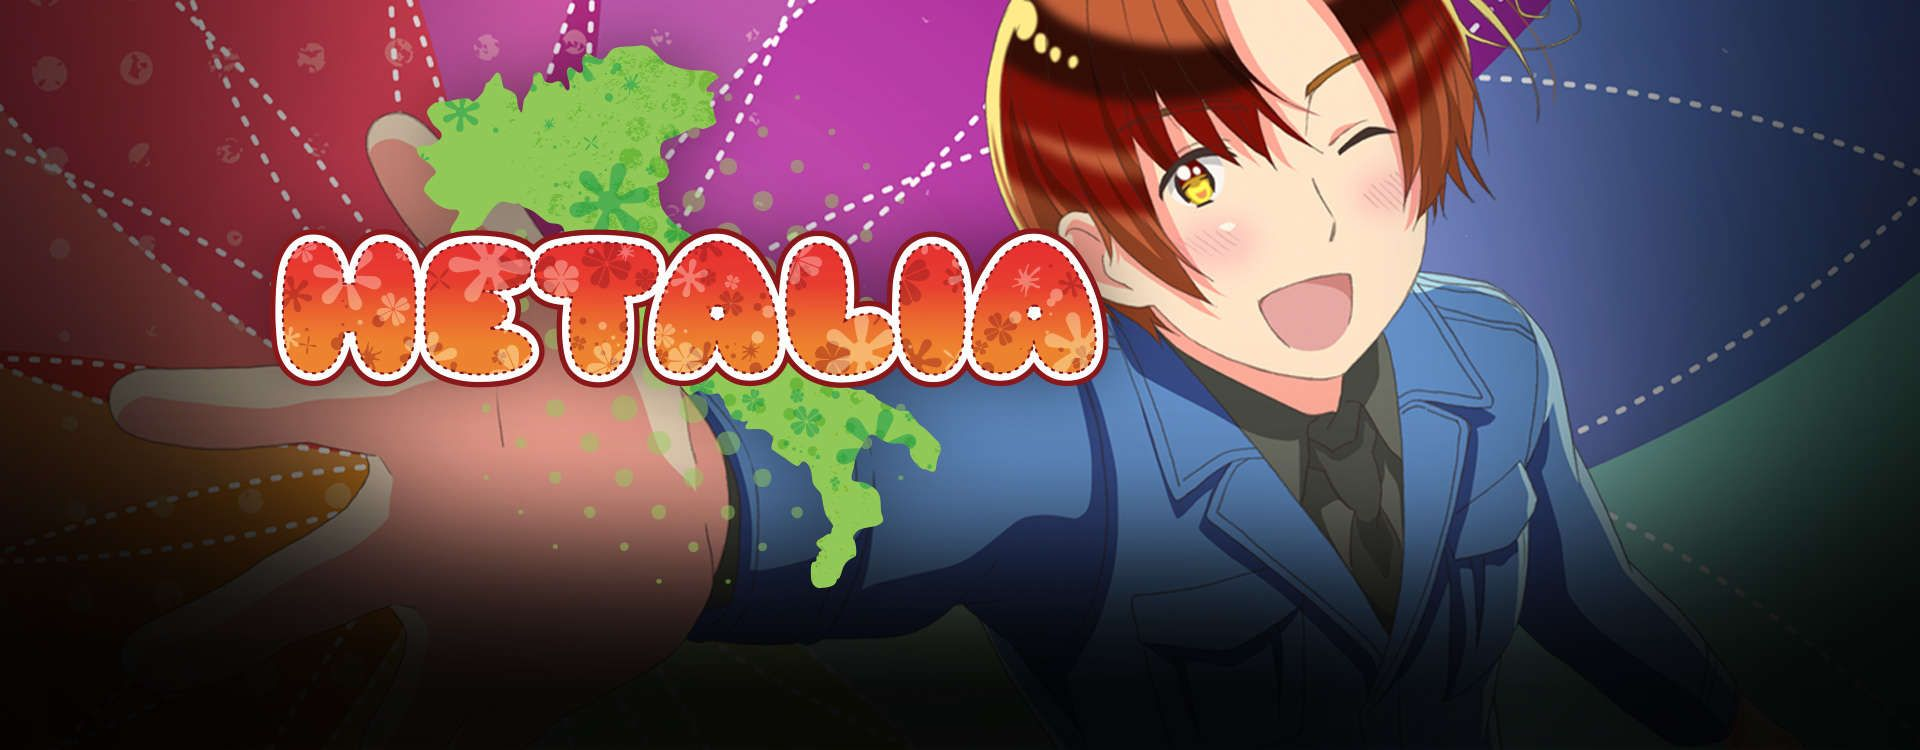 Hetalia with images hetalia anime hetalia